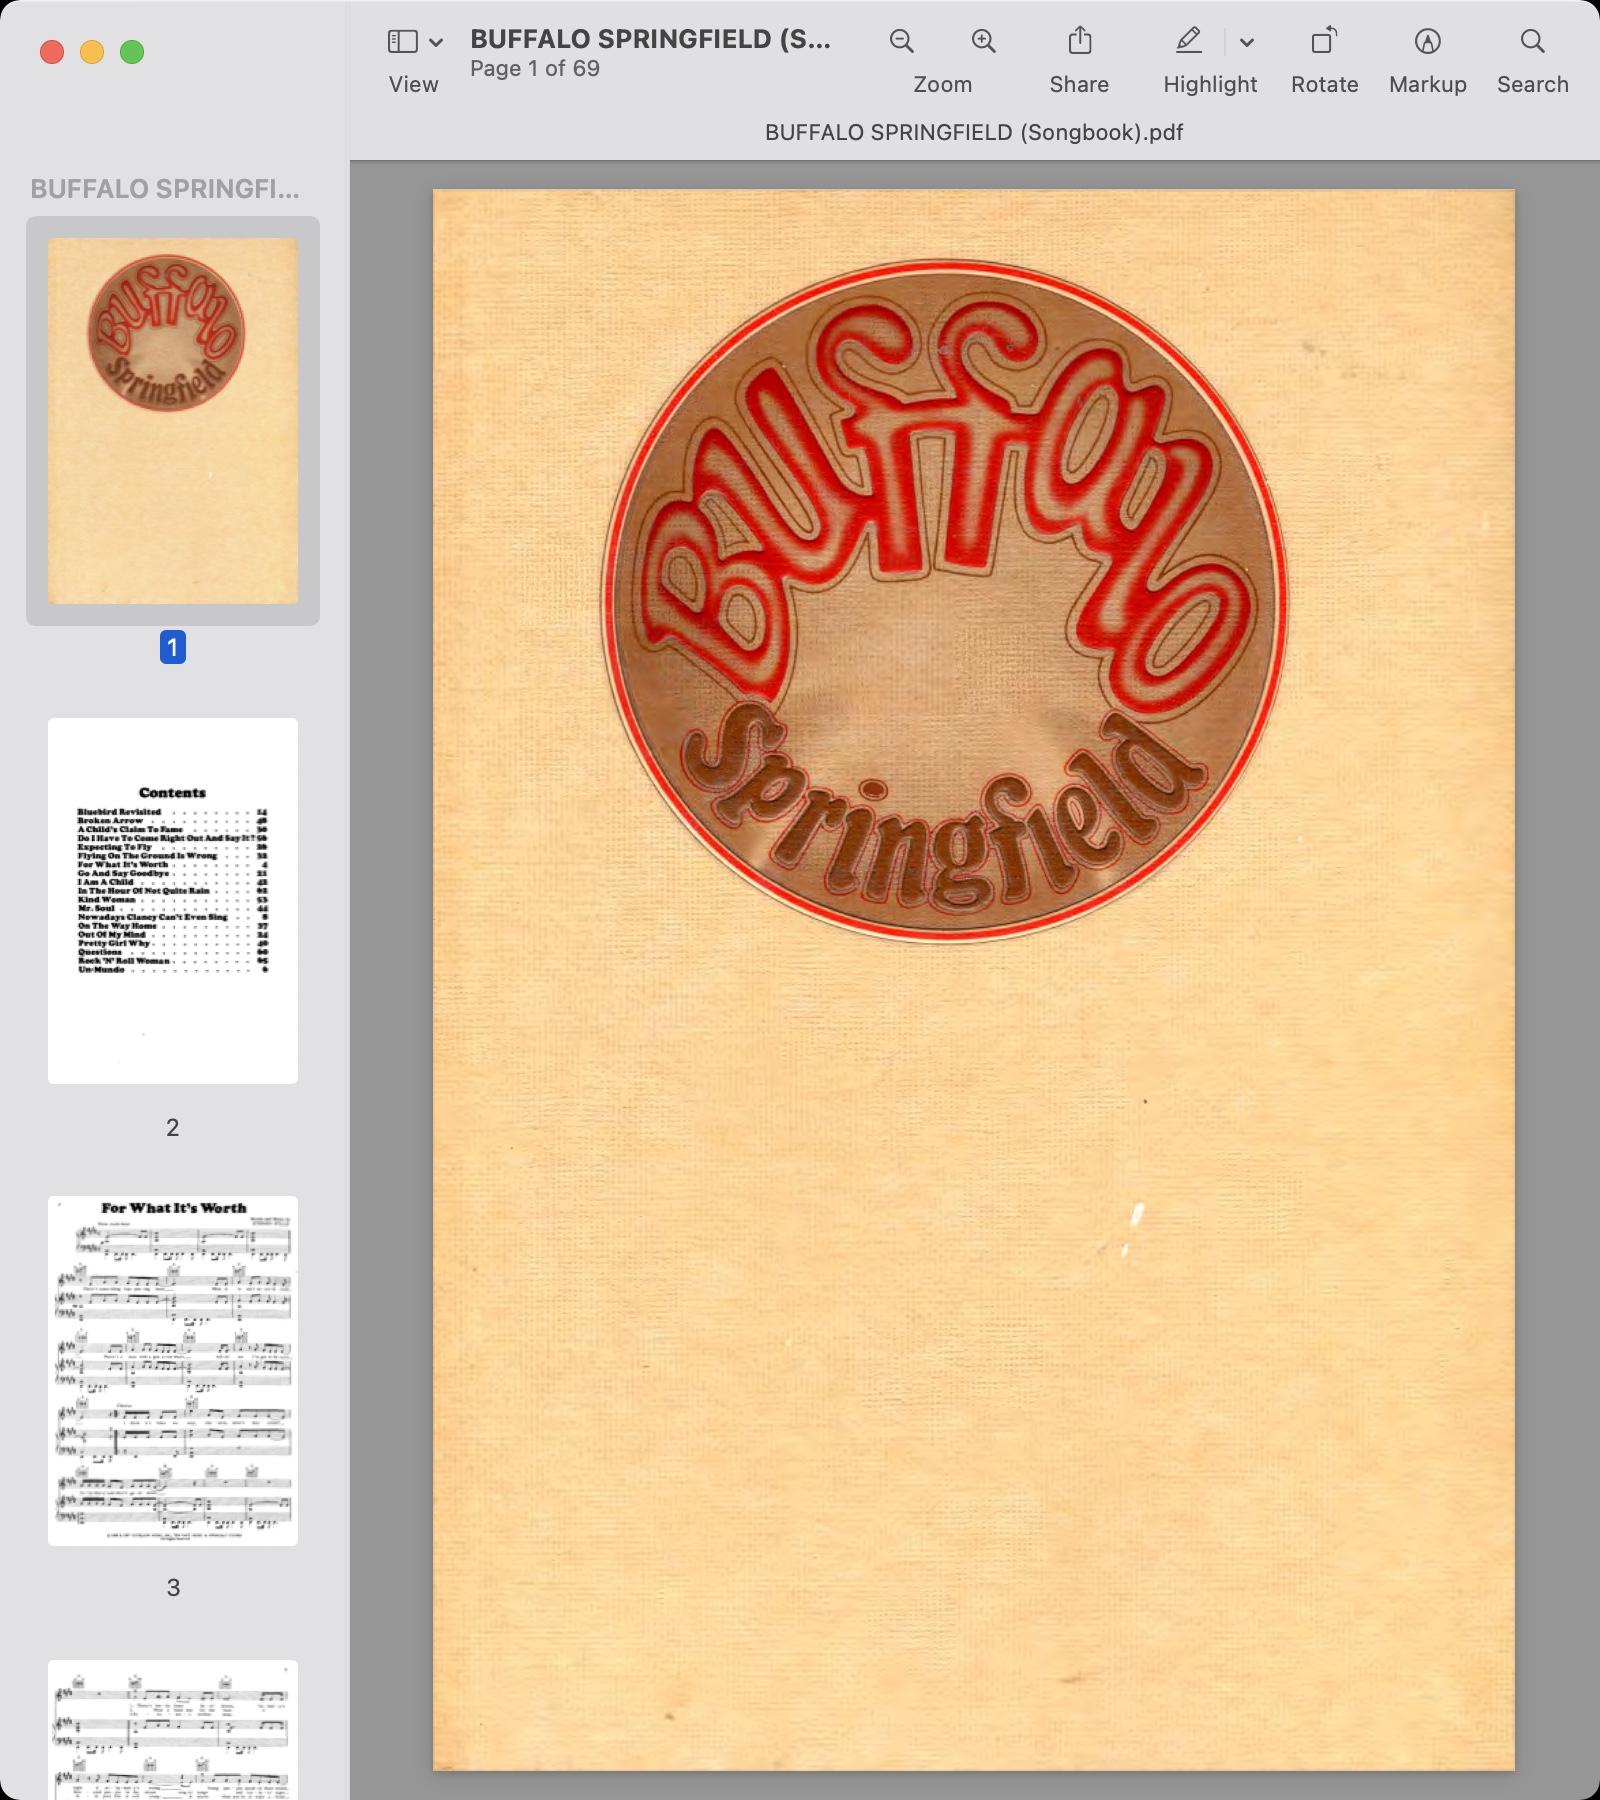 BUFFALO SPRINGFIELD (Songbook).jpg